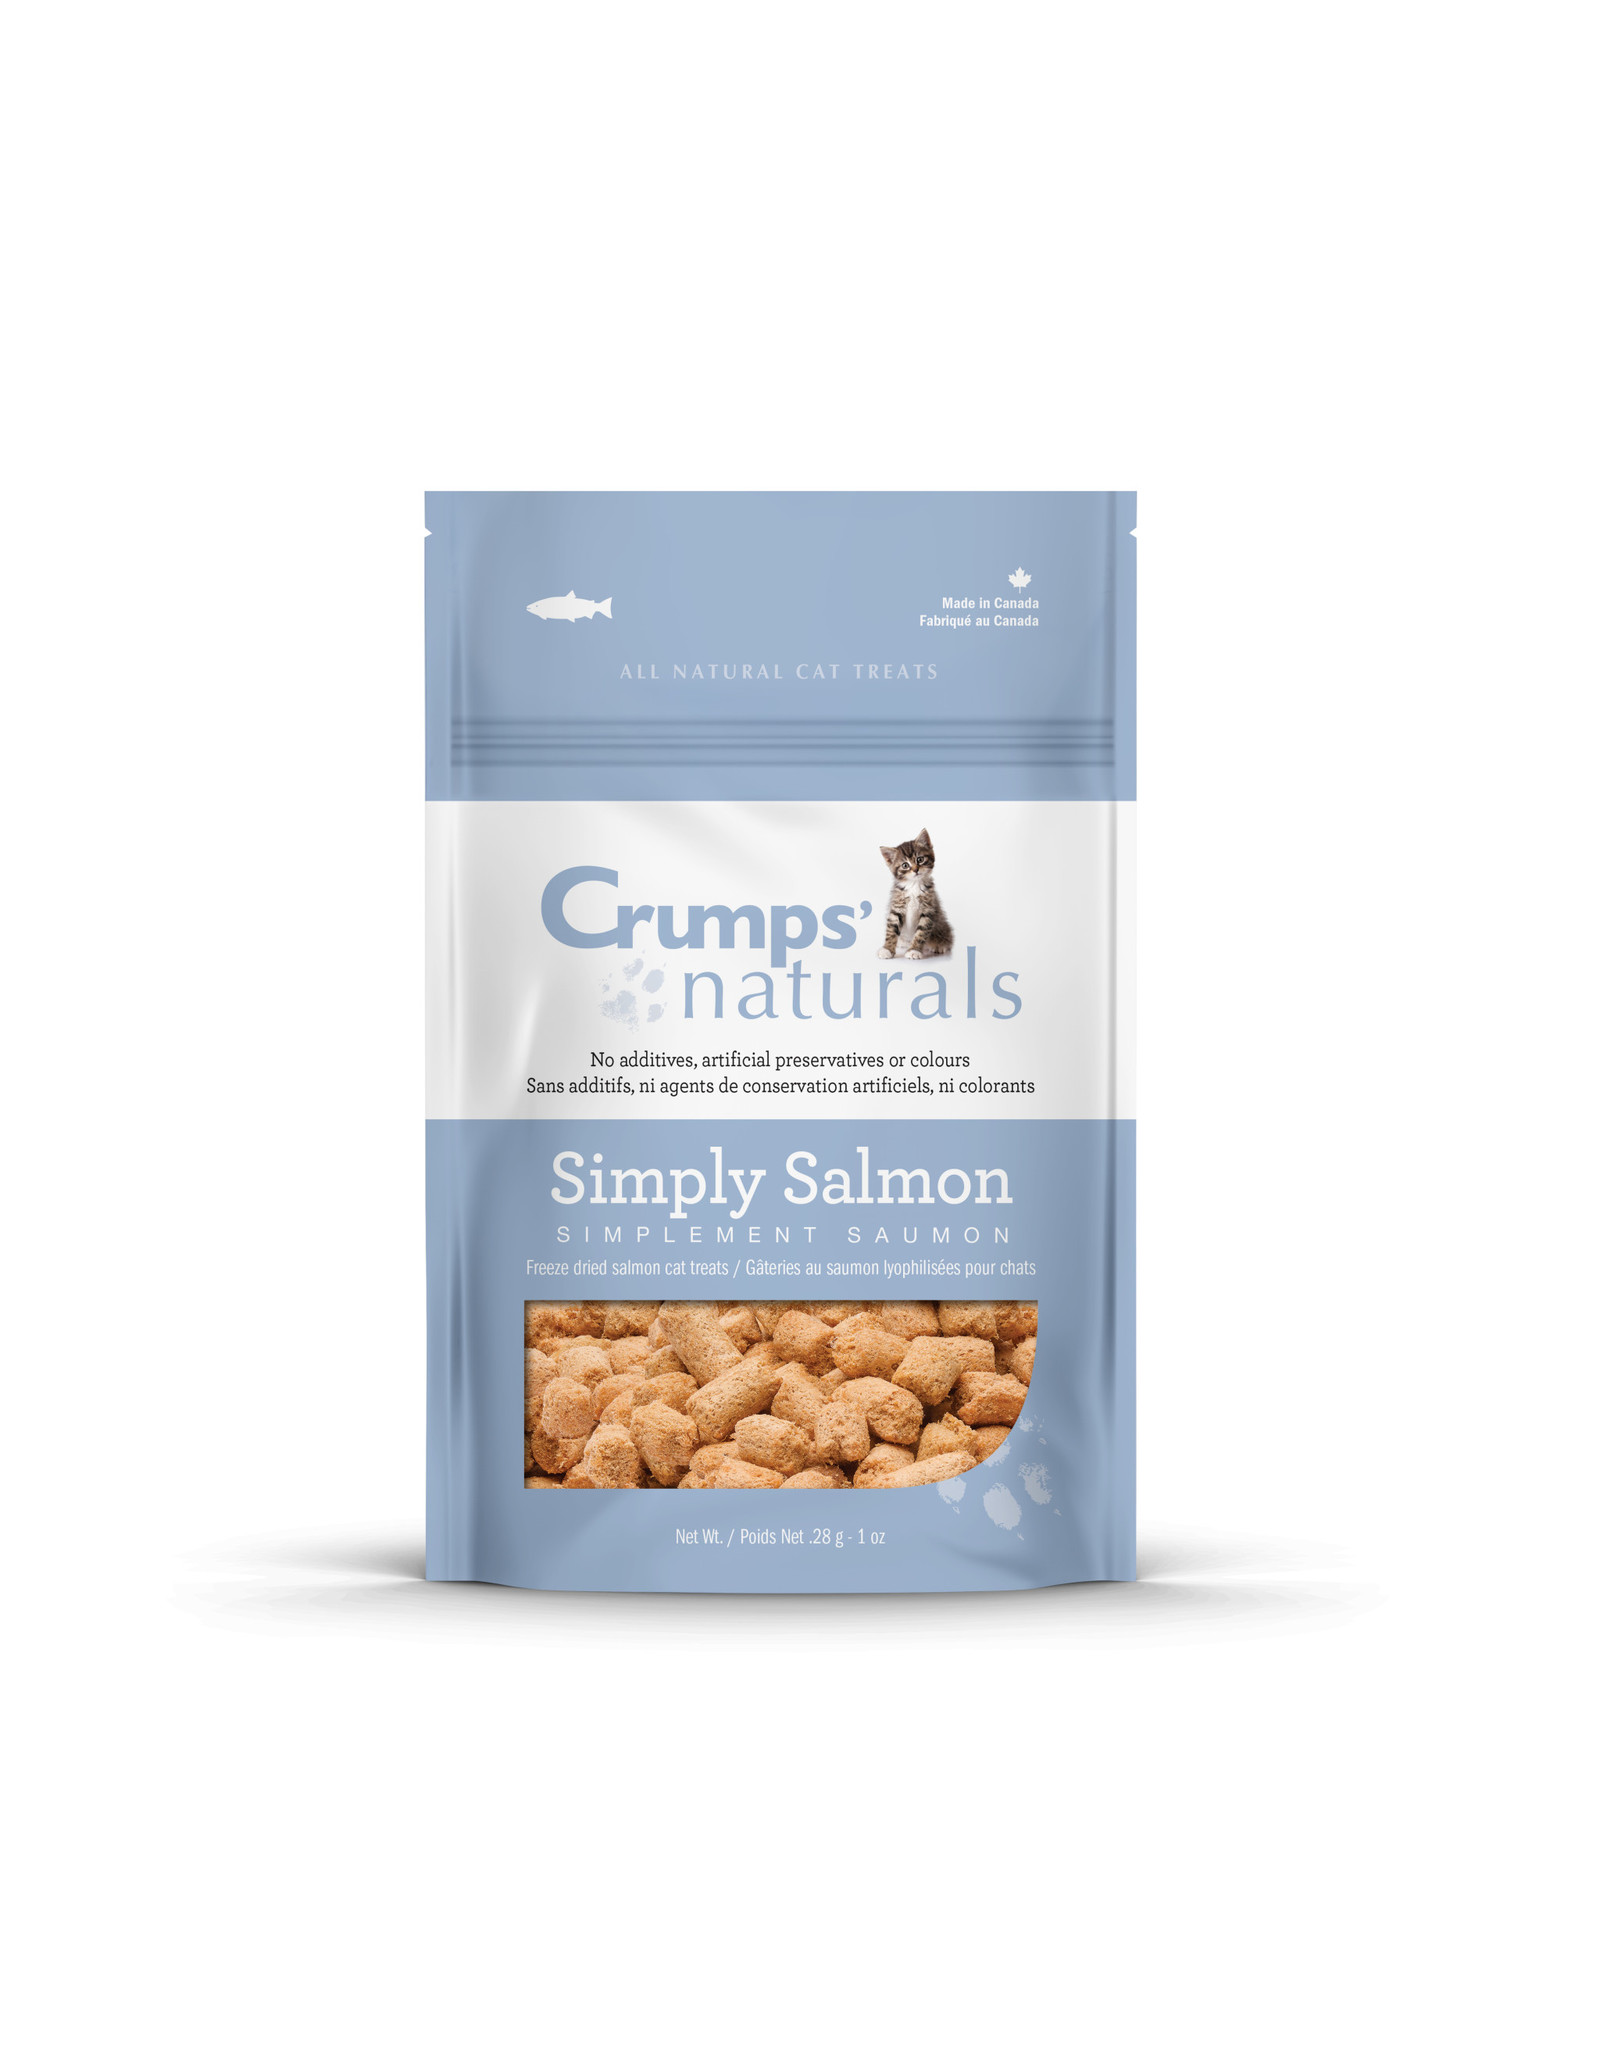 Crumps Crumps CAT Treats Simply Salmon